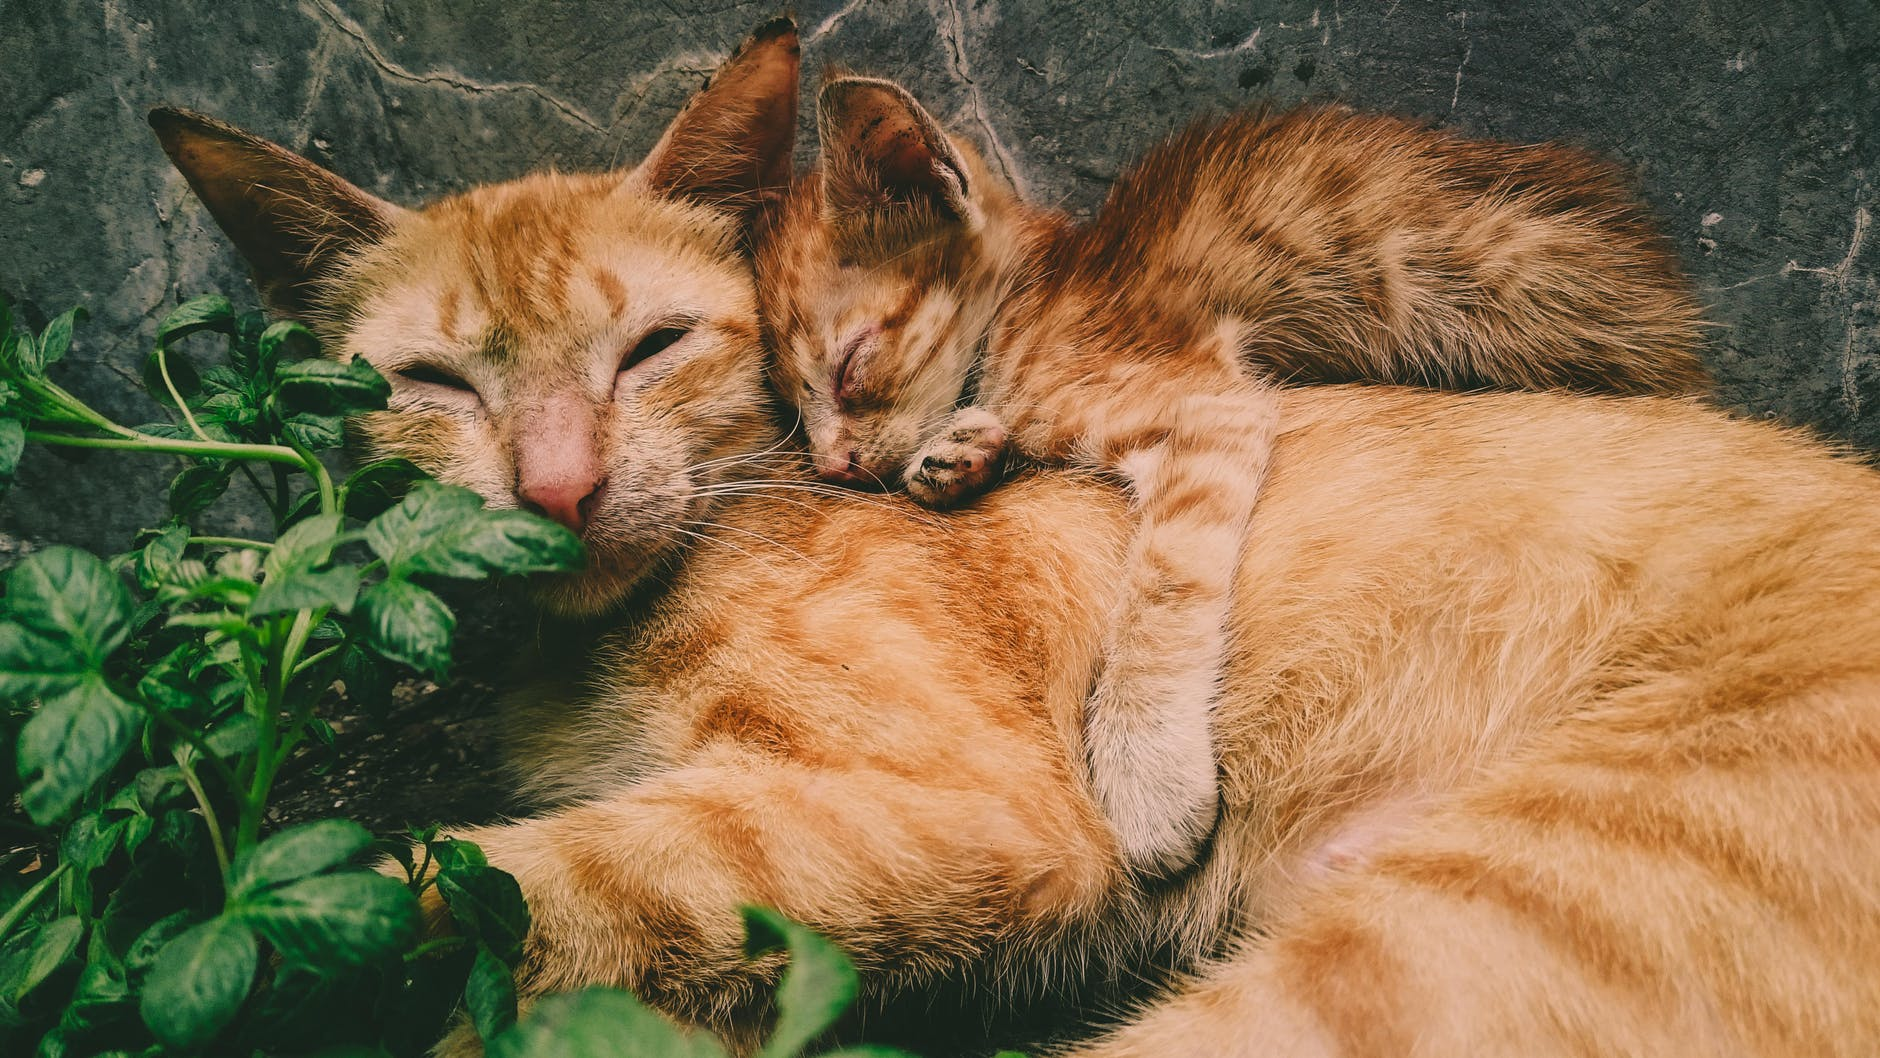 orange tabby cat and kitten